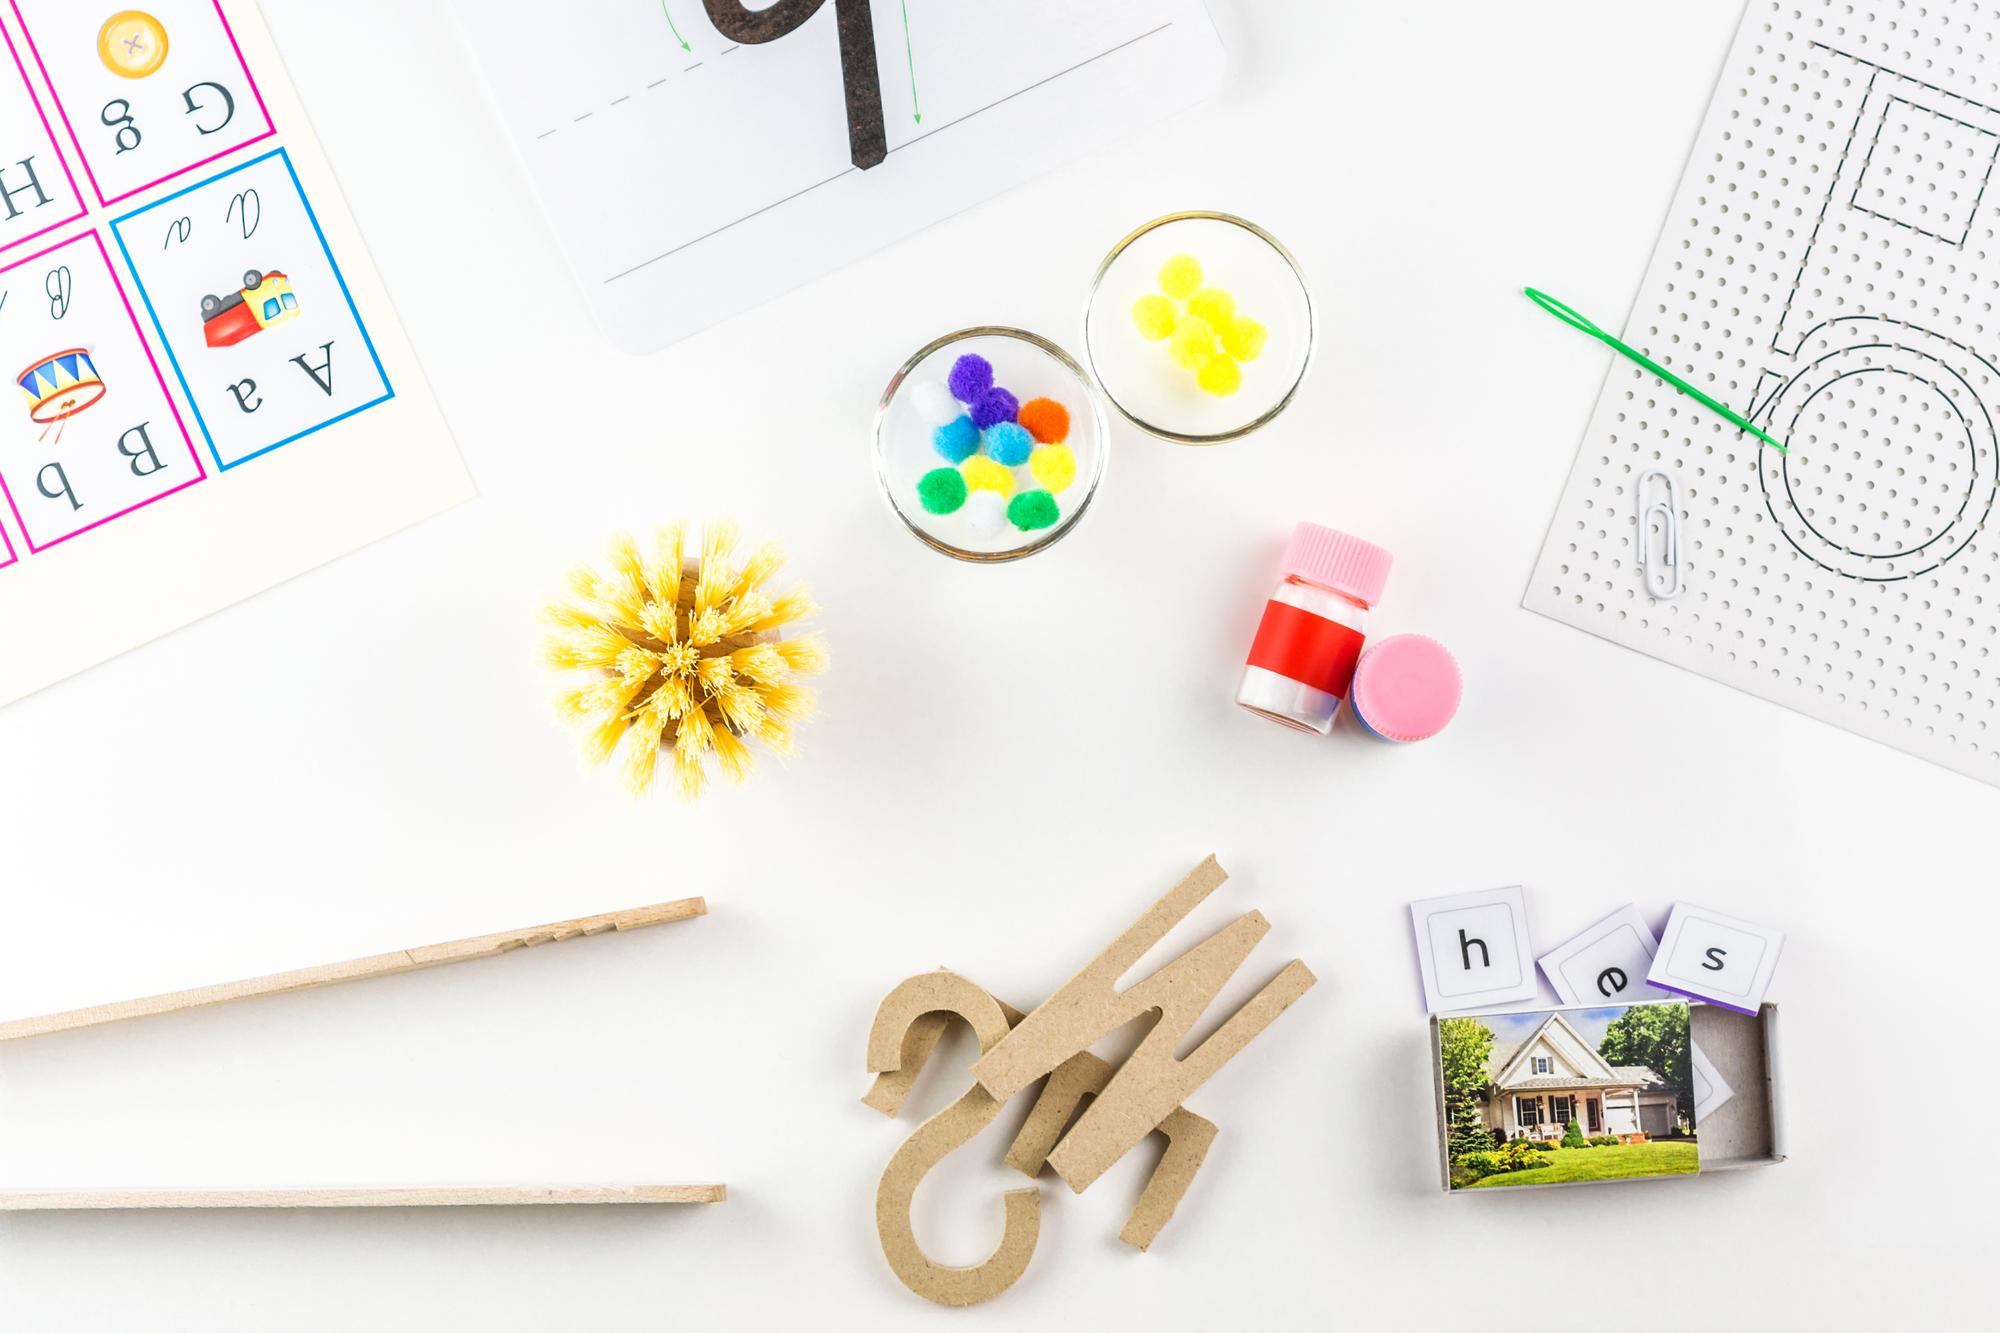 Educational tools used in Montessori